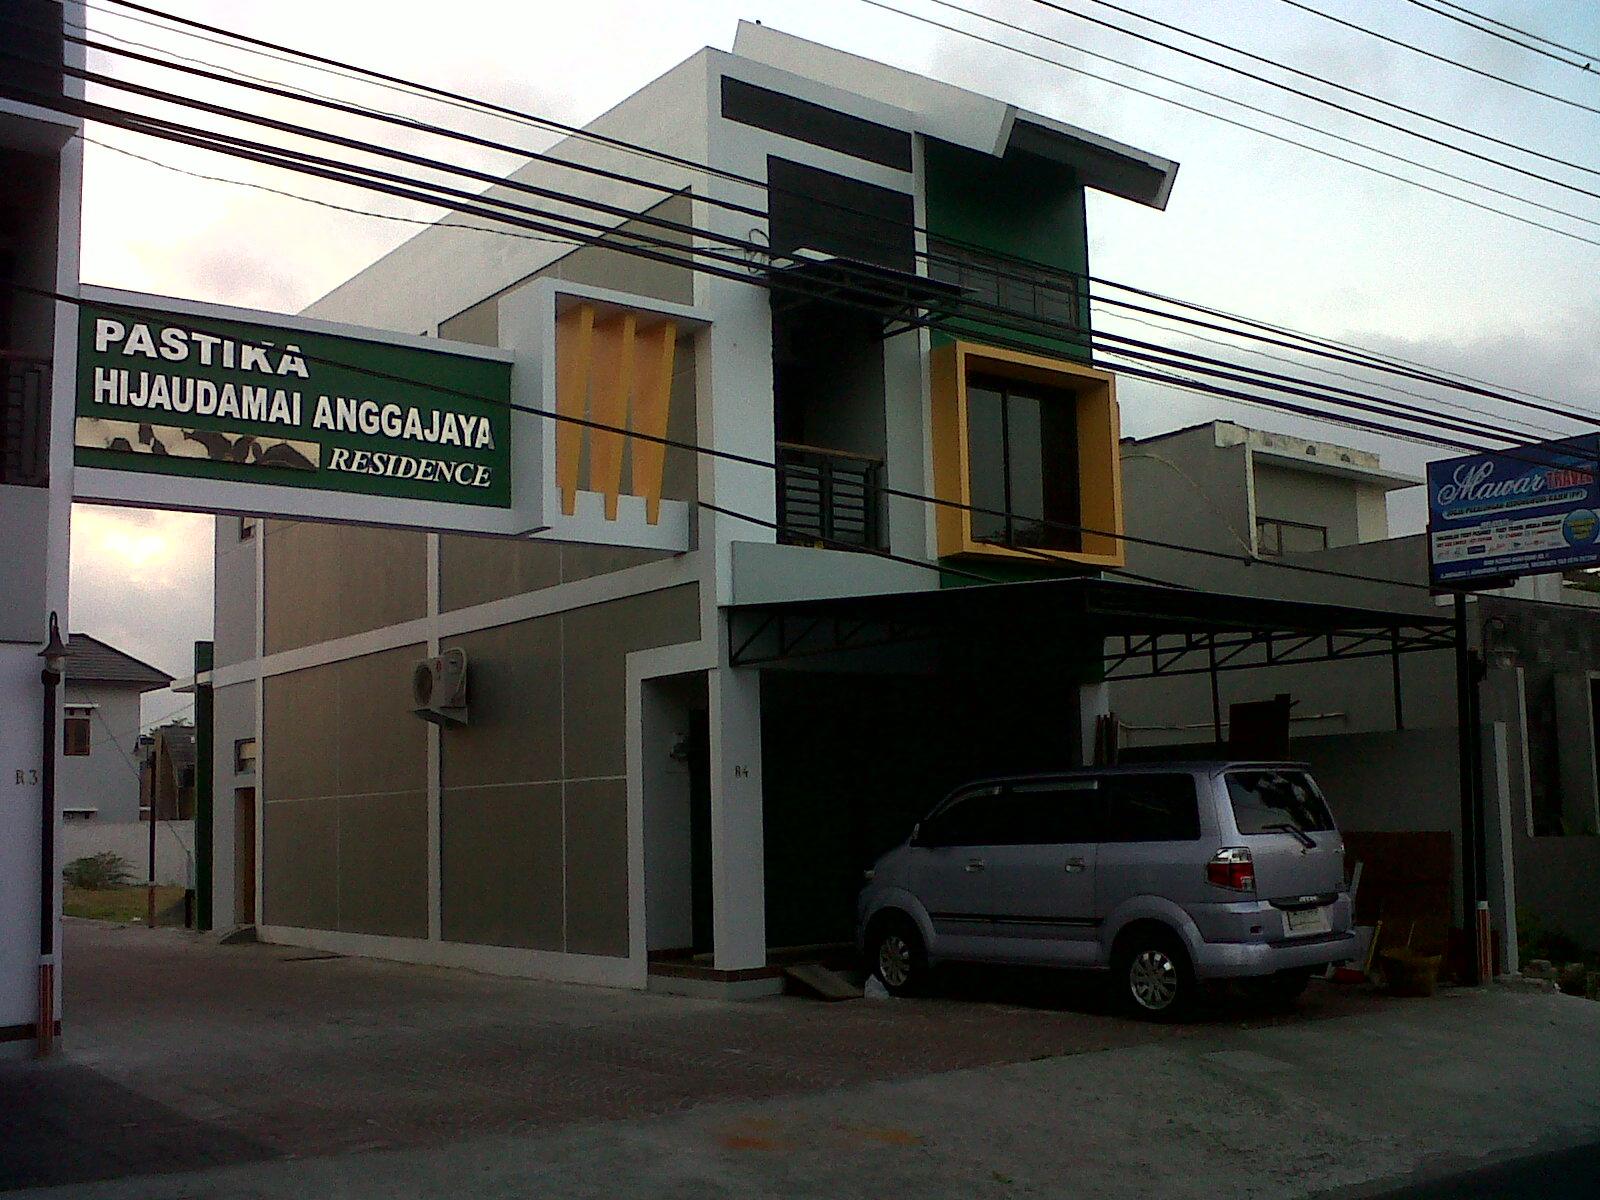 Ruko Perum Pastika Hijau Damai R4 4, Jl. Anggajaya 2 Sanggrahan ConCat Yk